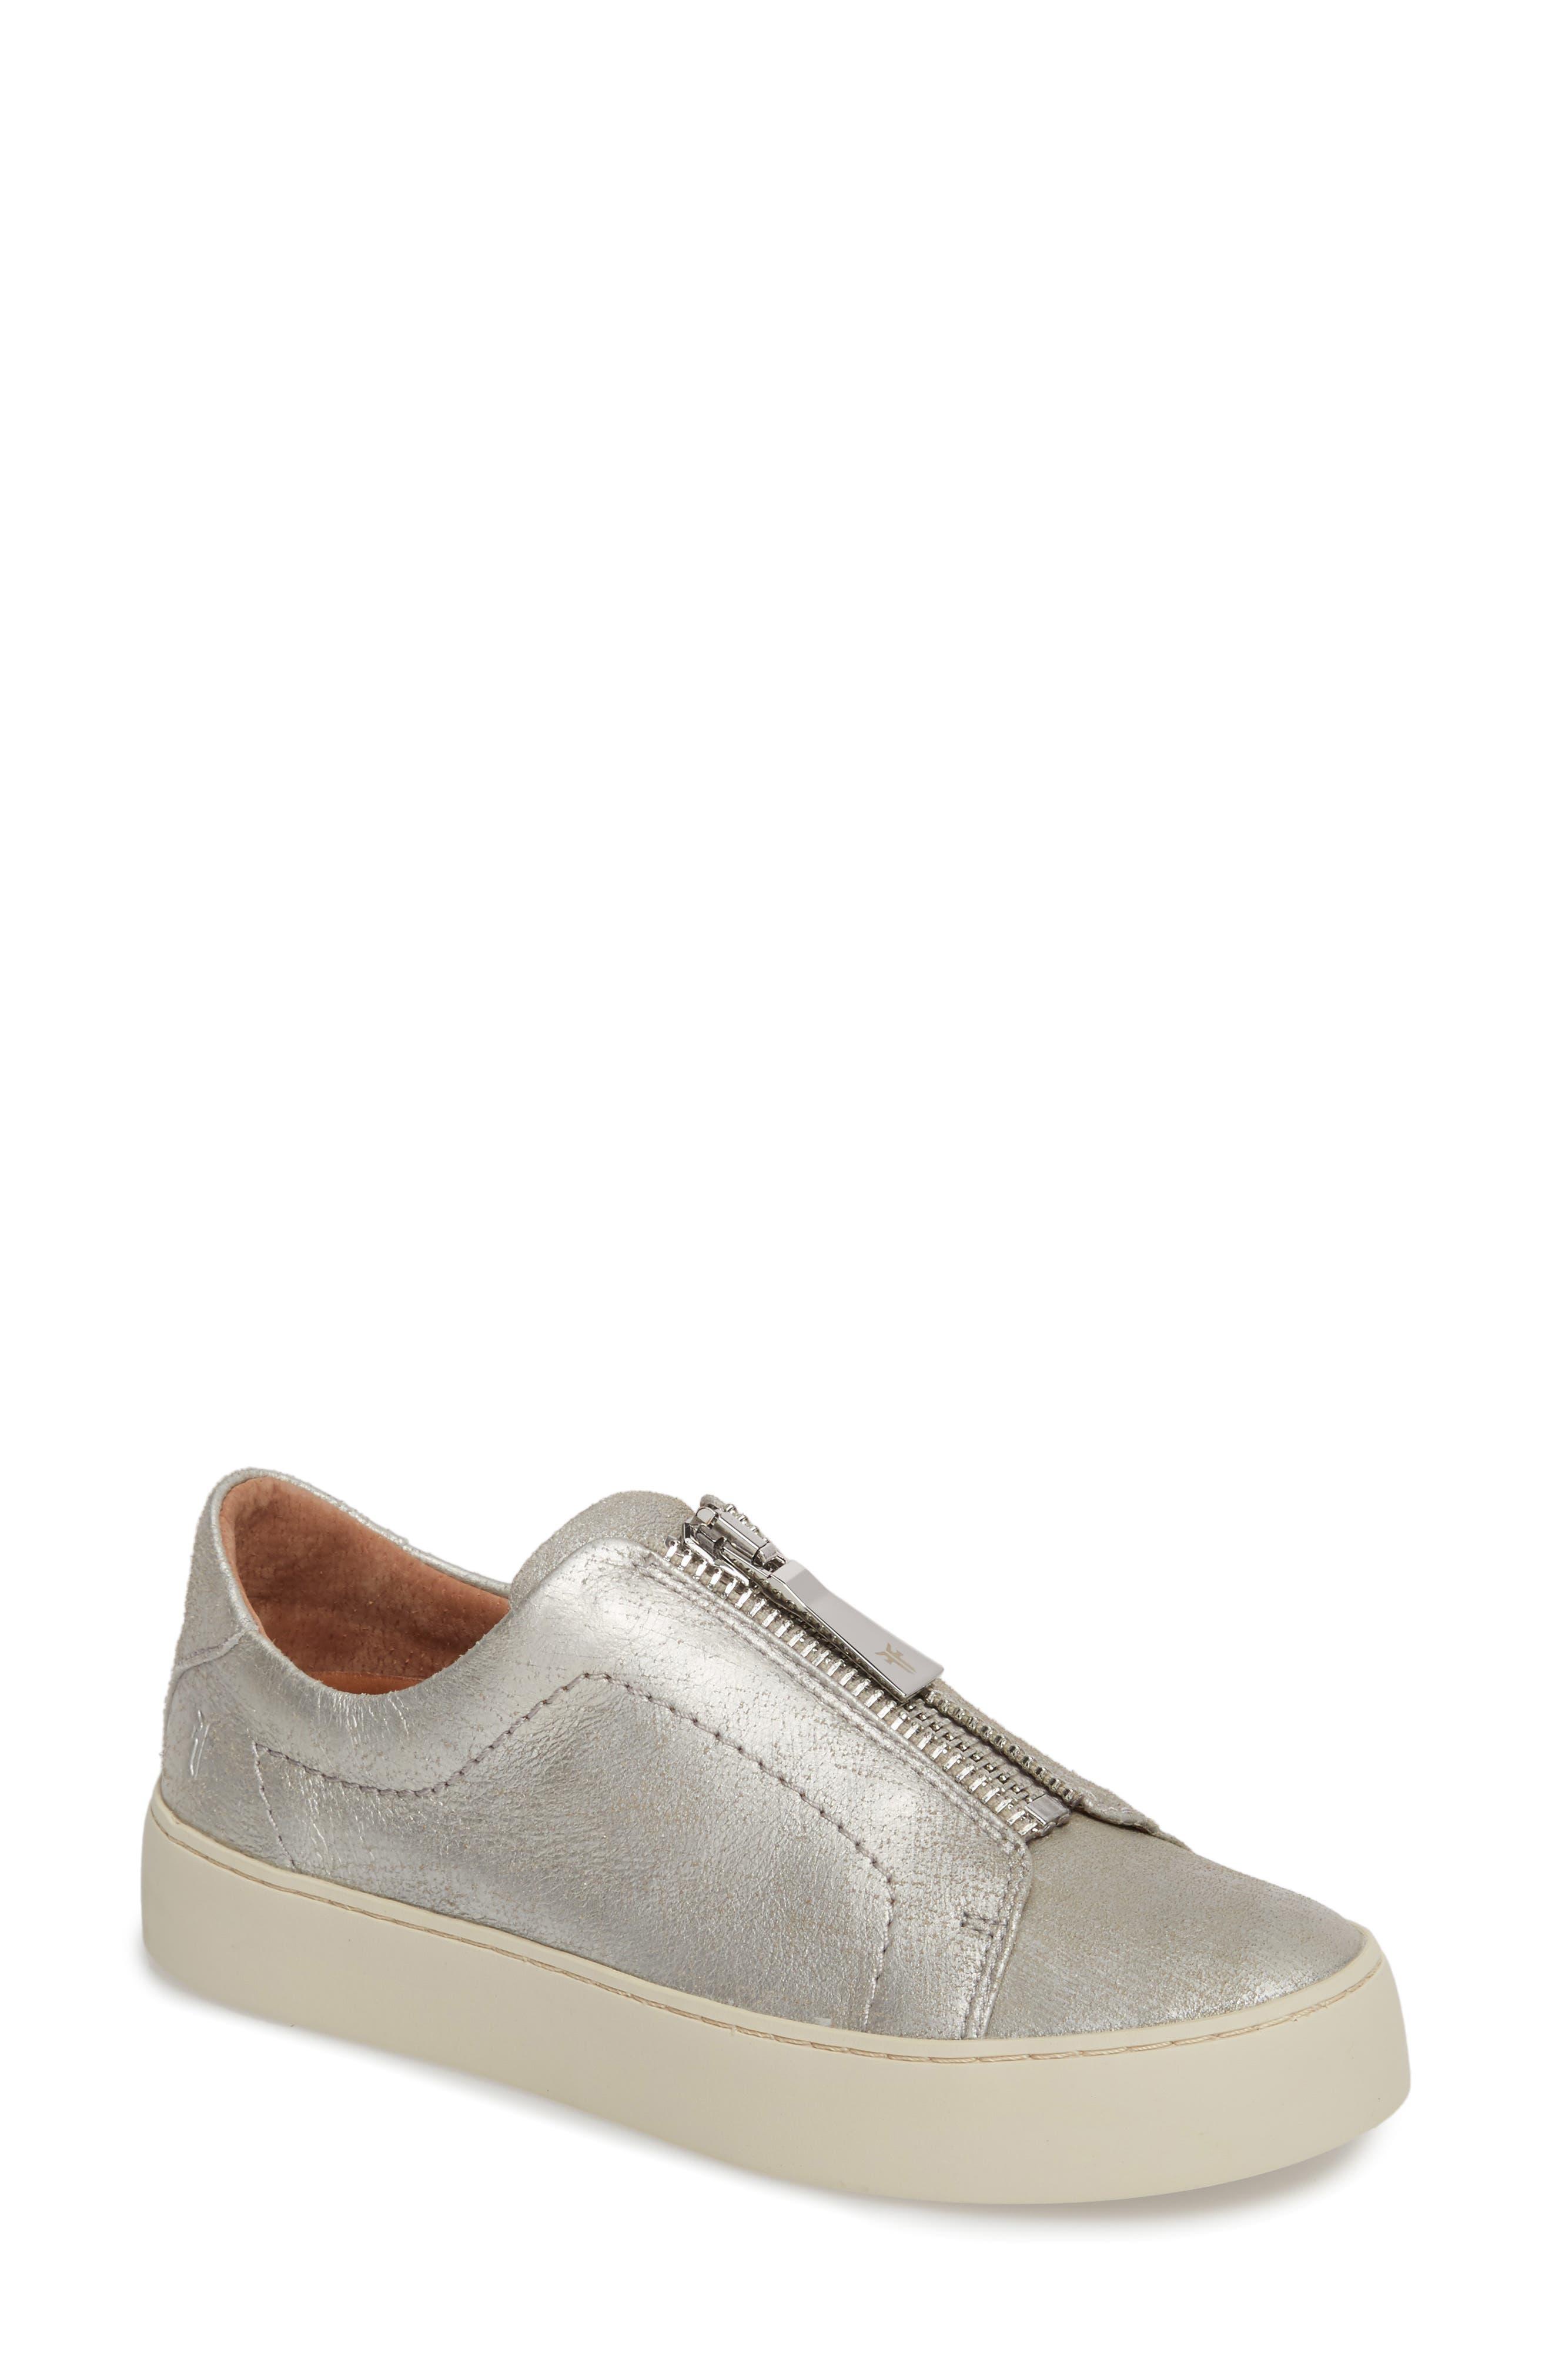 Lena Zip Sneaker,                         Main,                         color, 040